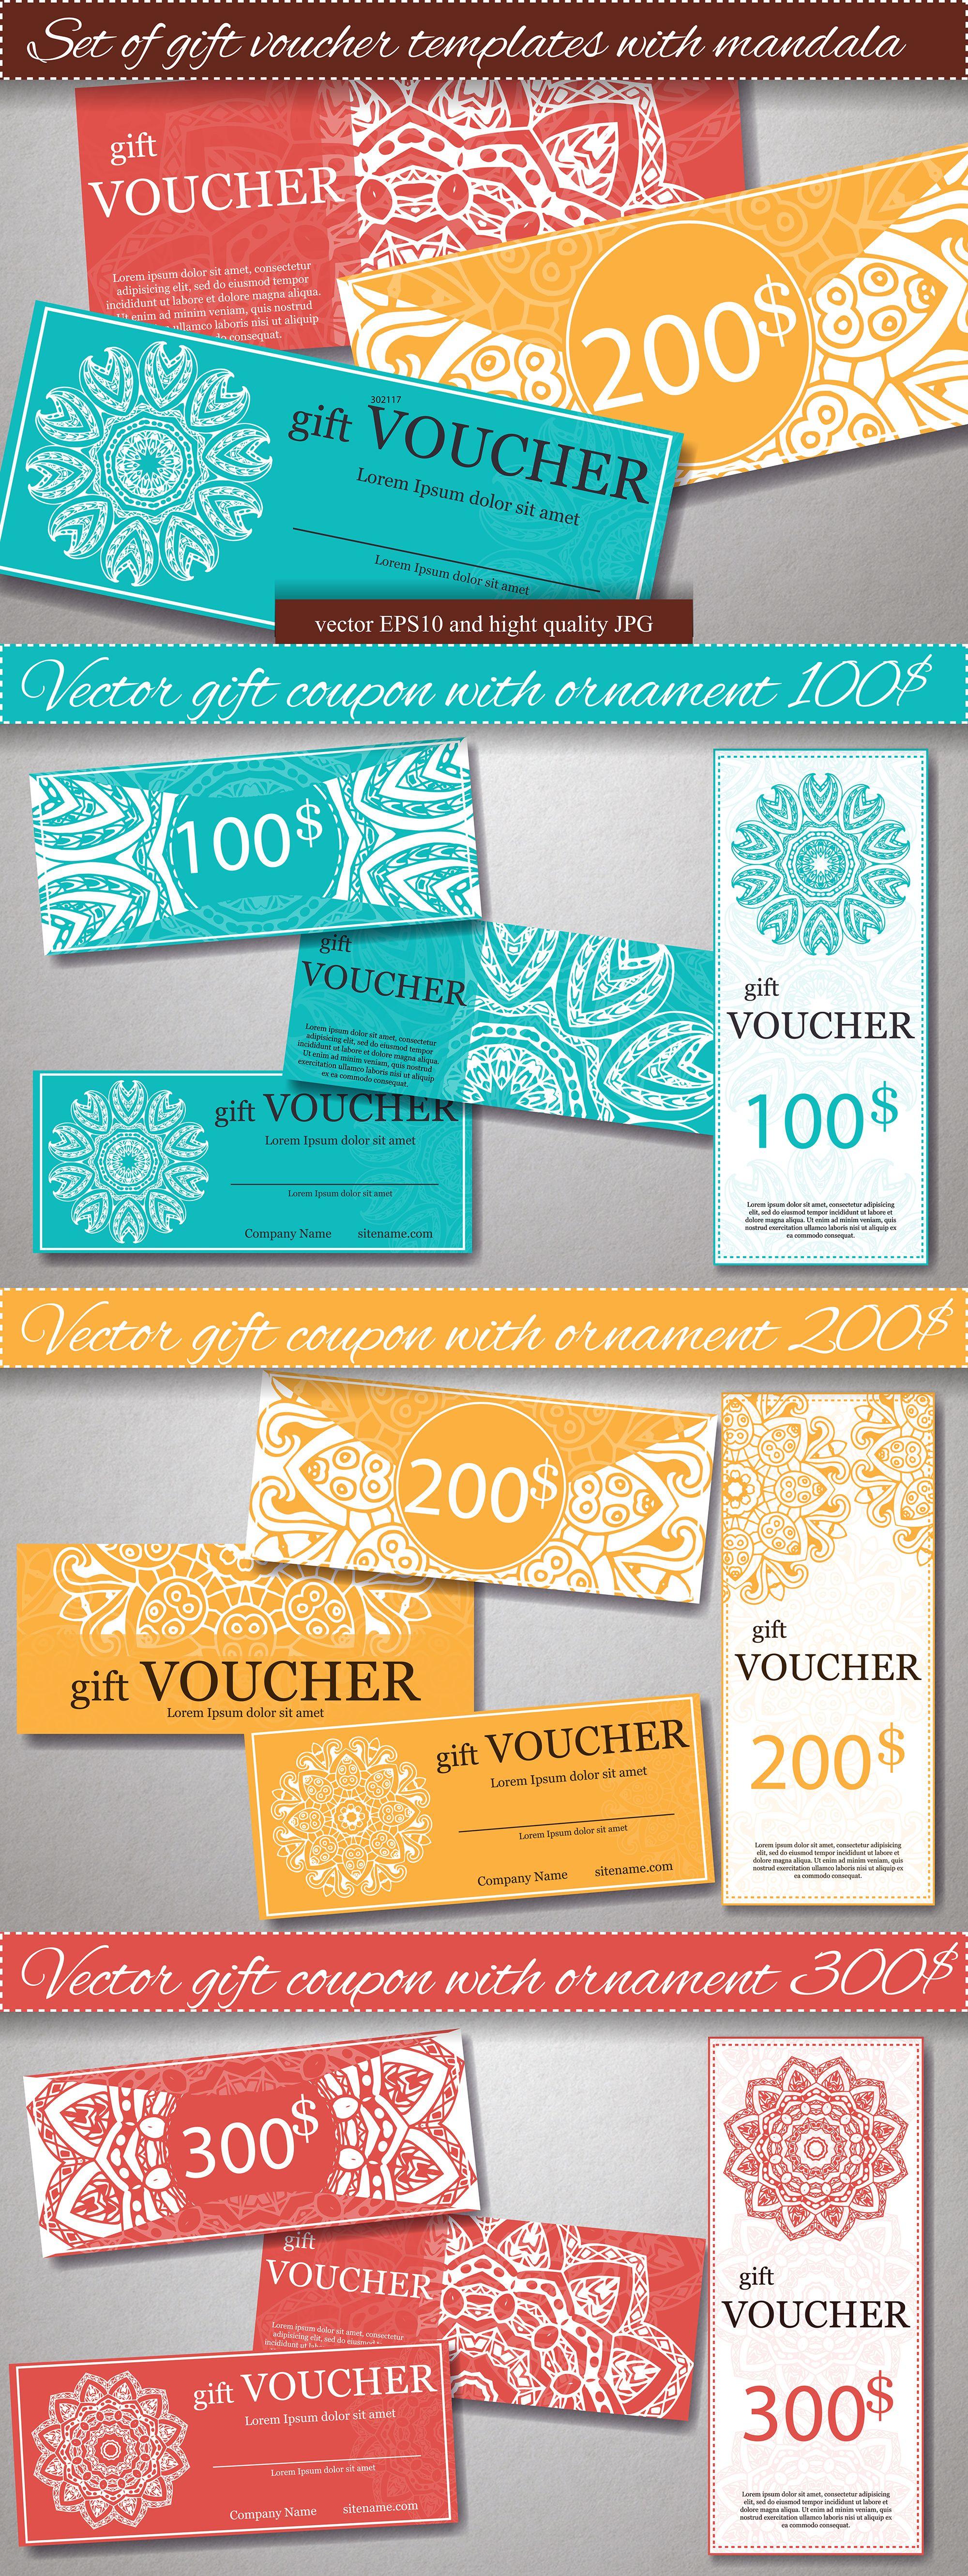 Set of gift voucher templates pinterest template business cards set of gift voucher templates vector eps design download httpscreativemarketastartejulia7893382936uksioks yelopaper Choice Image